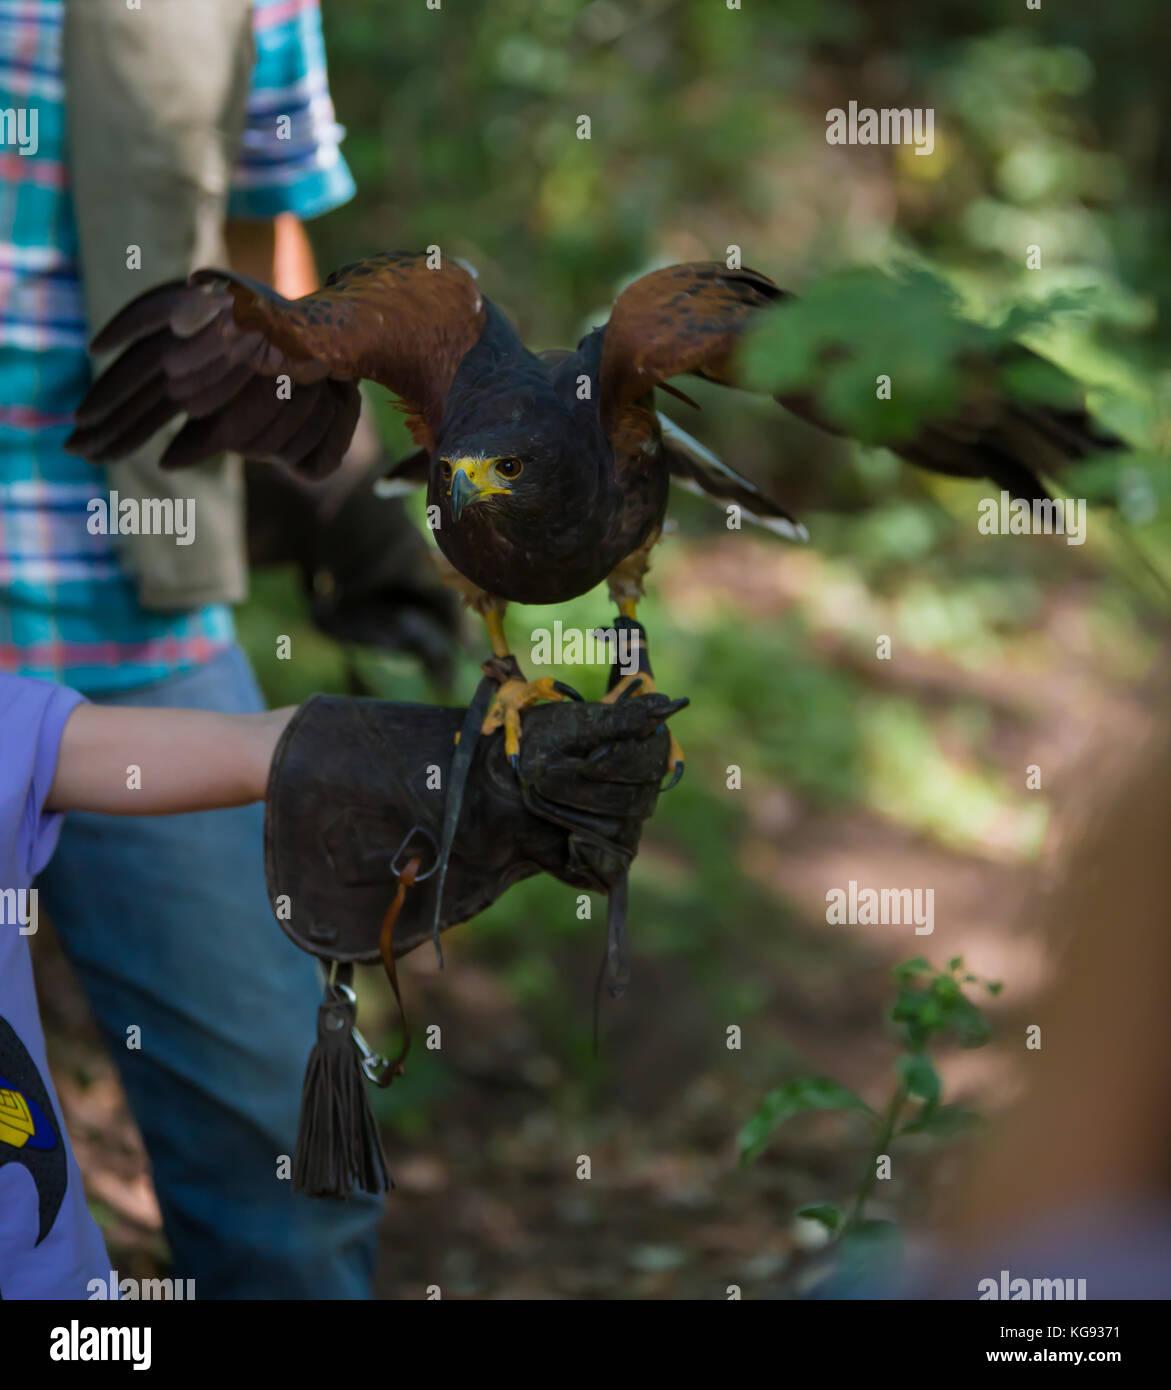 Parabuteo unicinctus - Harris's hawk - Buzzard of Harris in the wood, on a child's hand - Stock Image